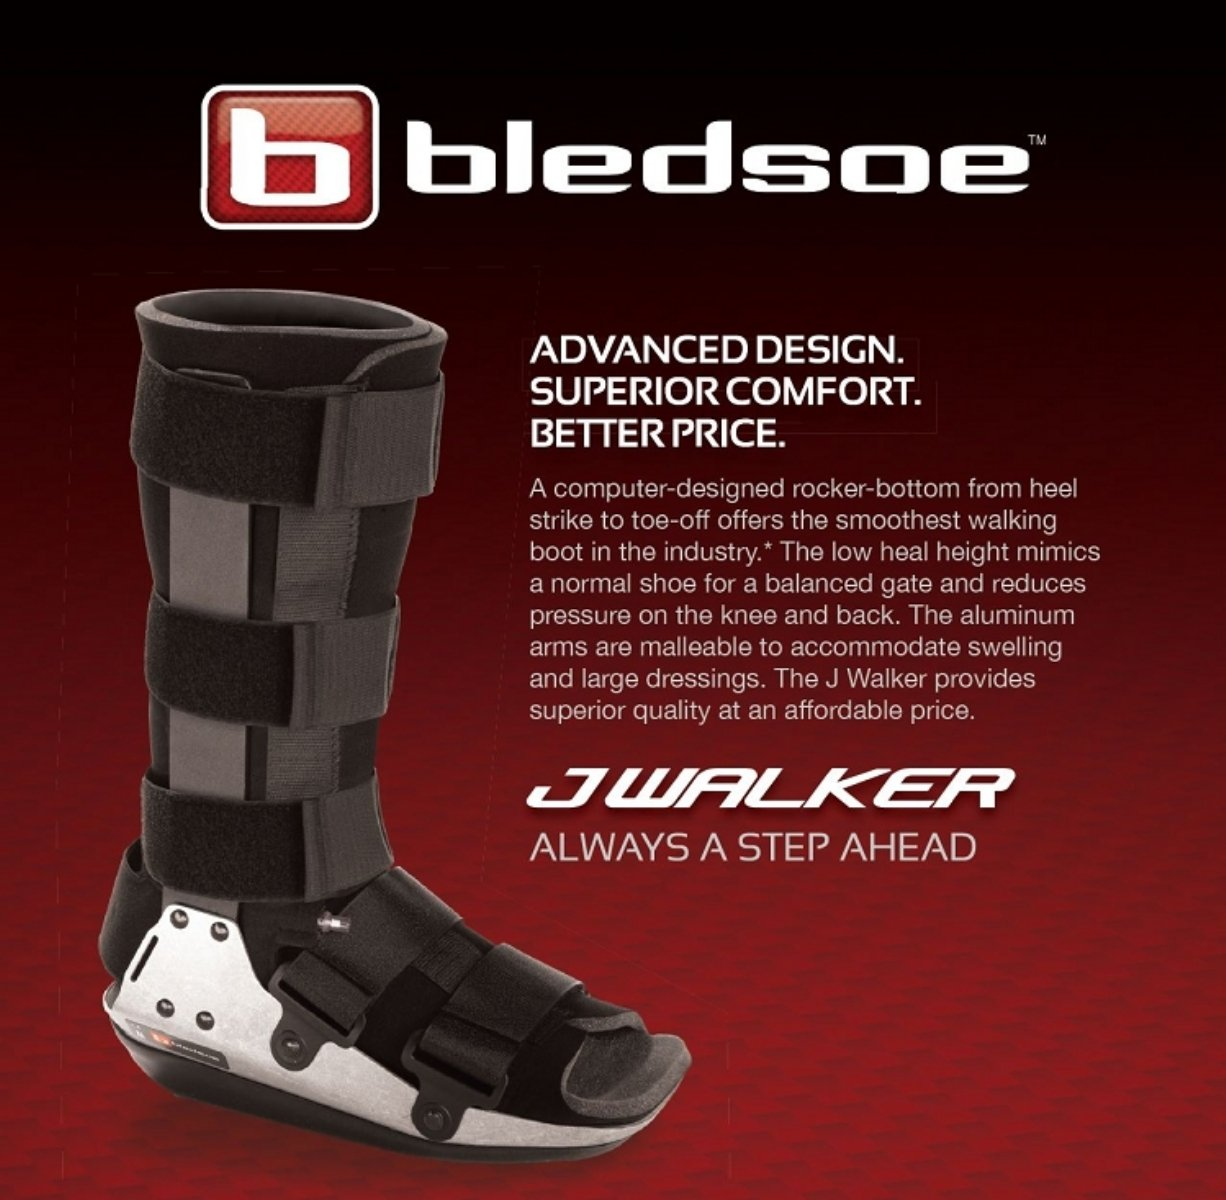 048a1af777d Amazon.com: Bledsoe JWalker Fracture Cast Boot, With Air Standard ...